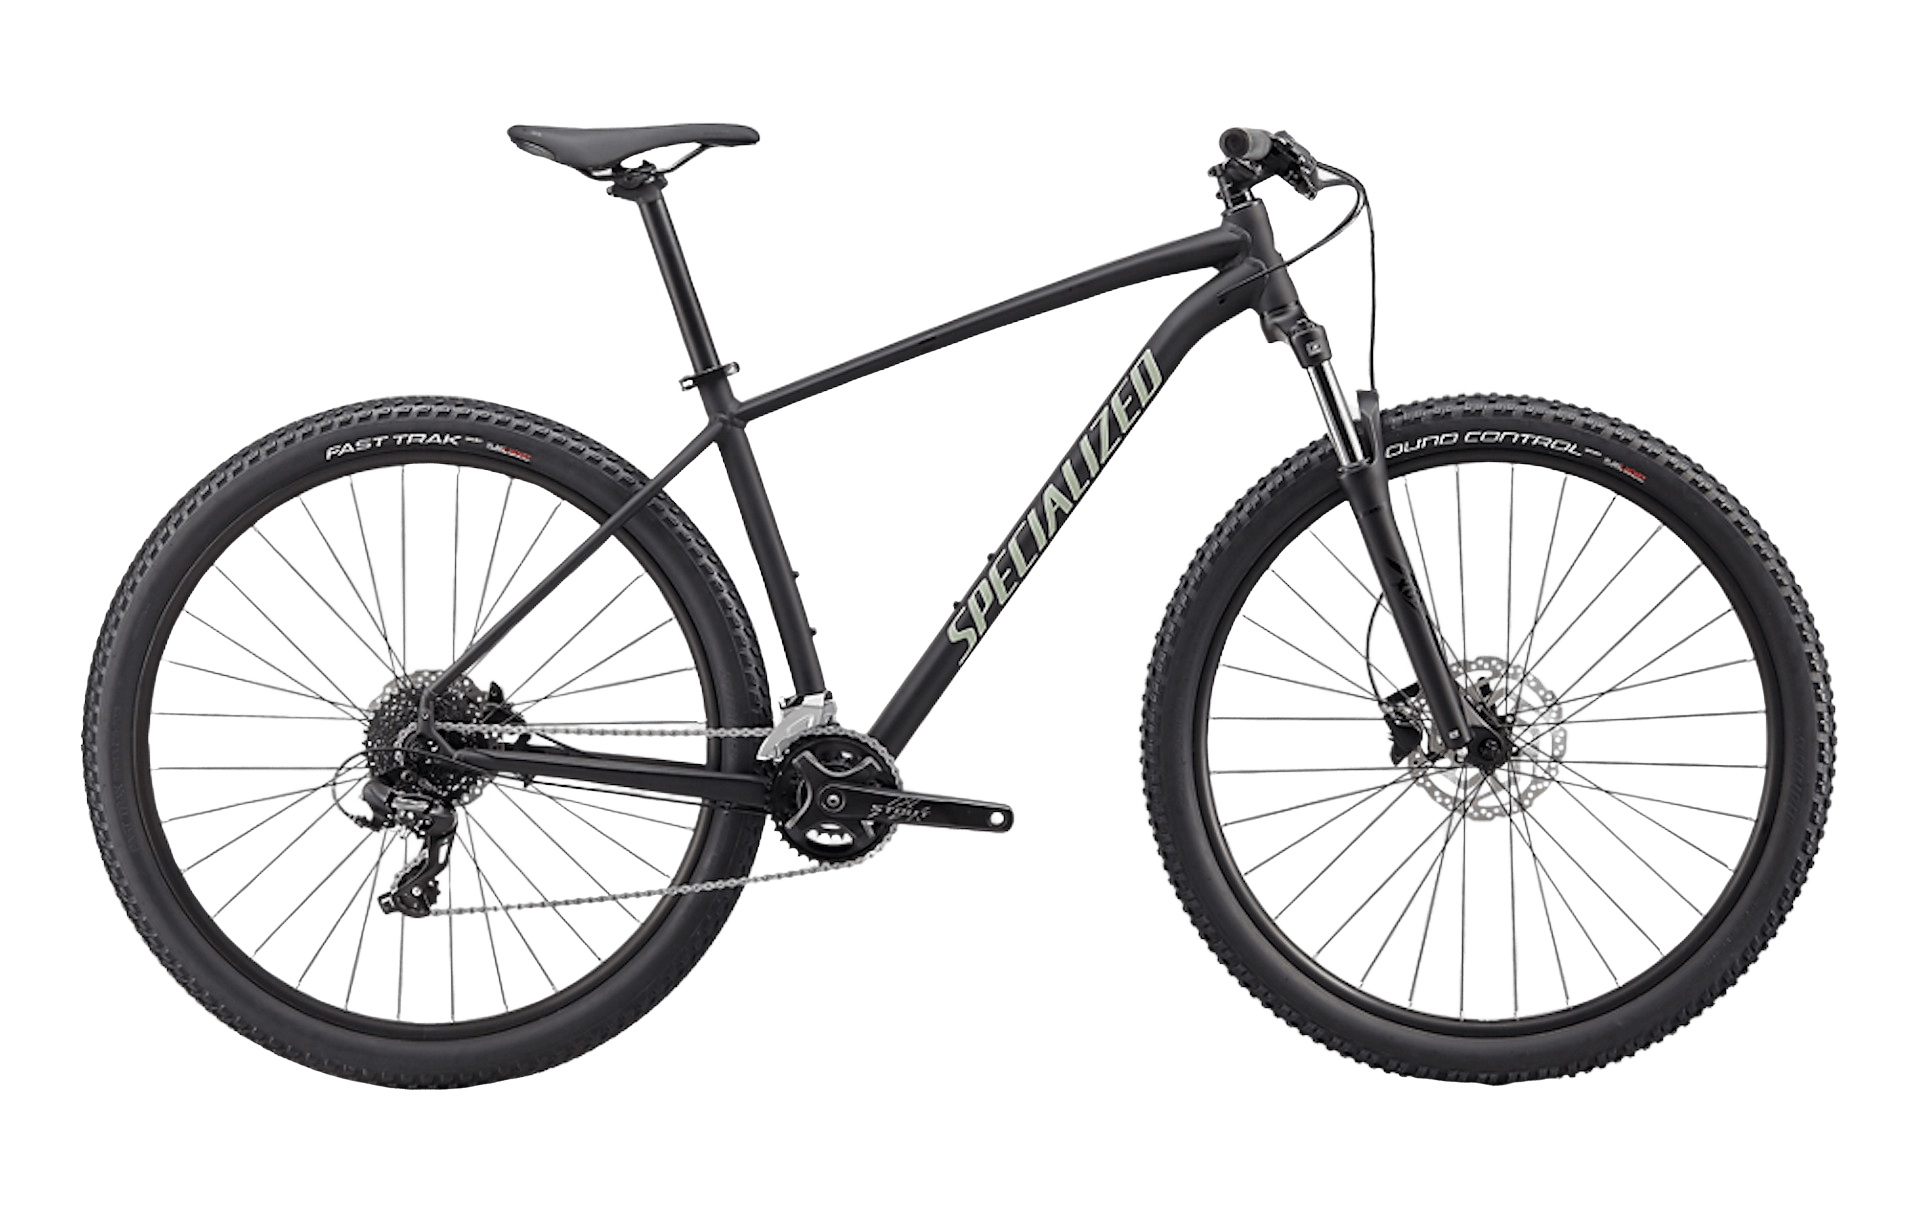 specialized rockhopper mountainbike